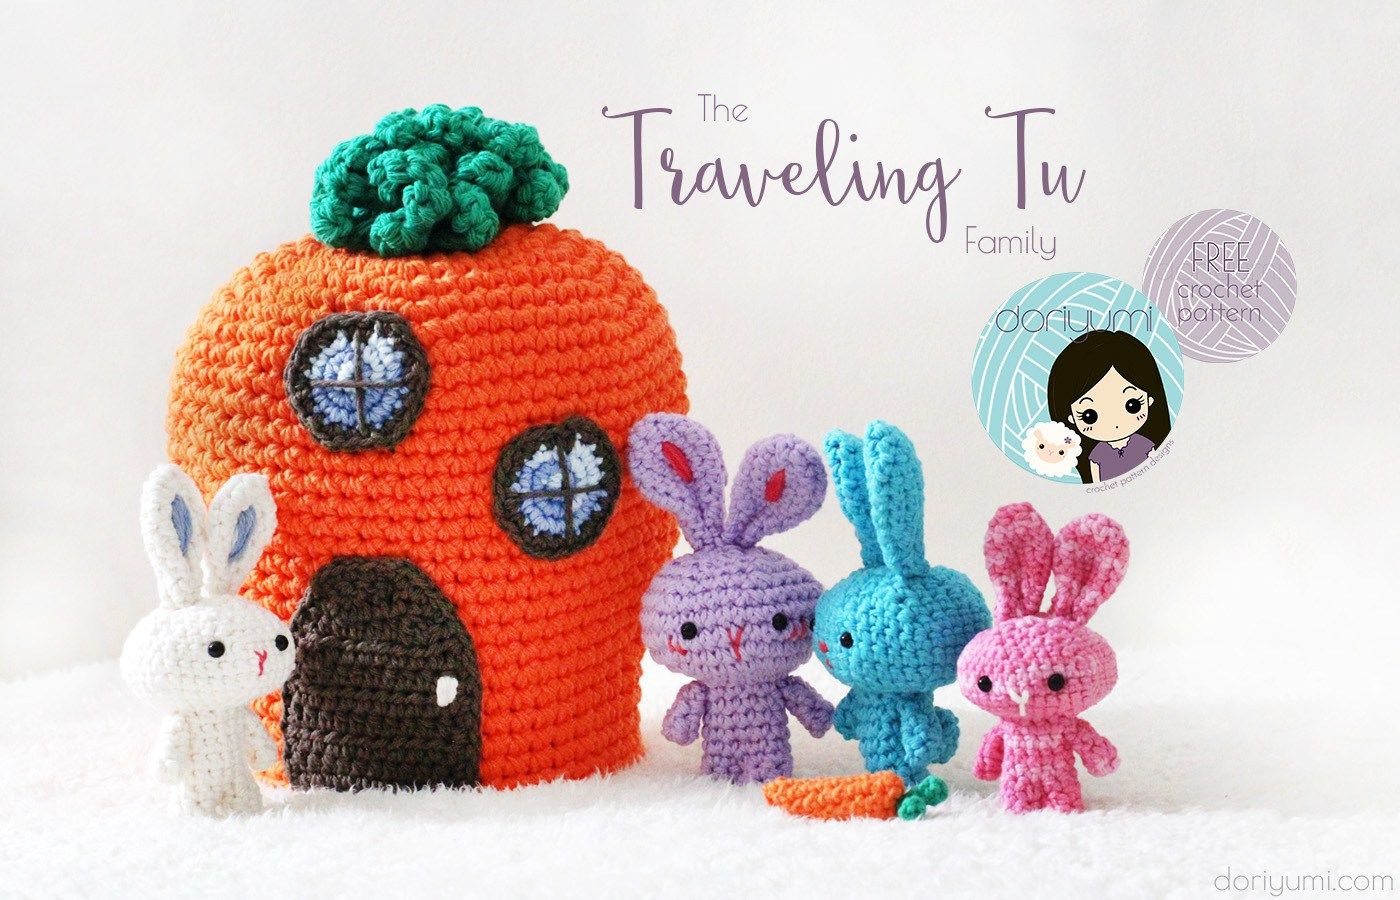 Traveling Tu Family - free crochet pattern by DORIYUMI | Crochet ...